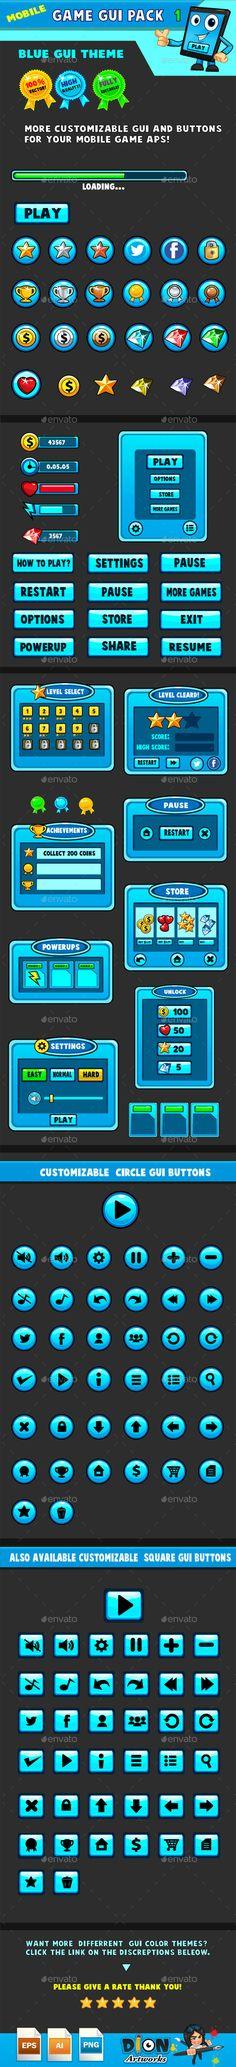 Mobile games GUI Pack Transparent PNG, Vector EPS, AI Illustrator. Download here: https://graphicriver.net/item/mobile-games-gui-pack1-blue-theme/9453260?ref=ksioks